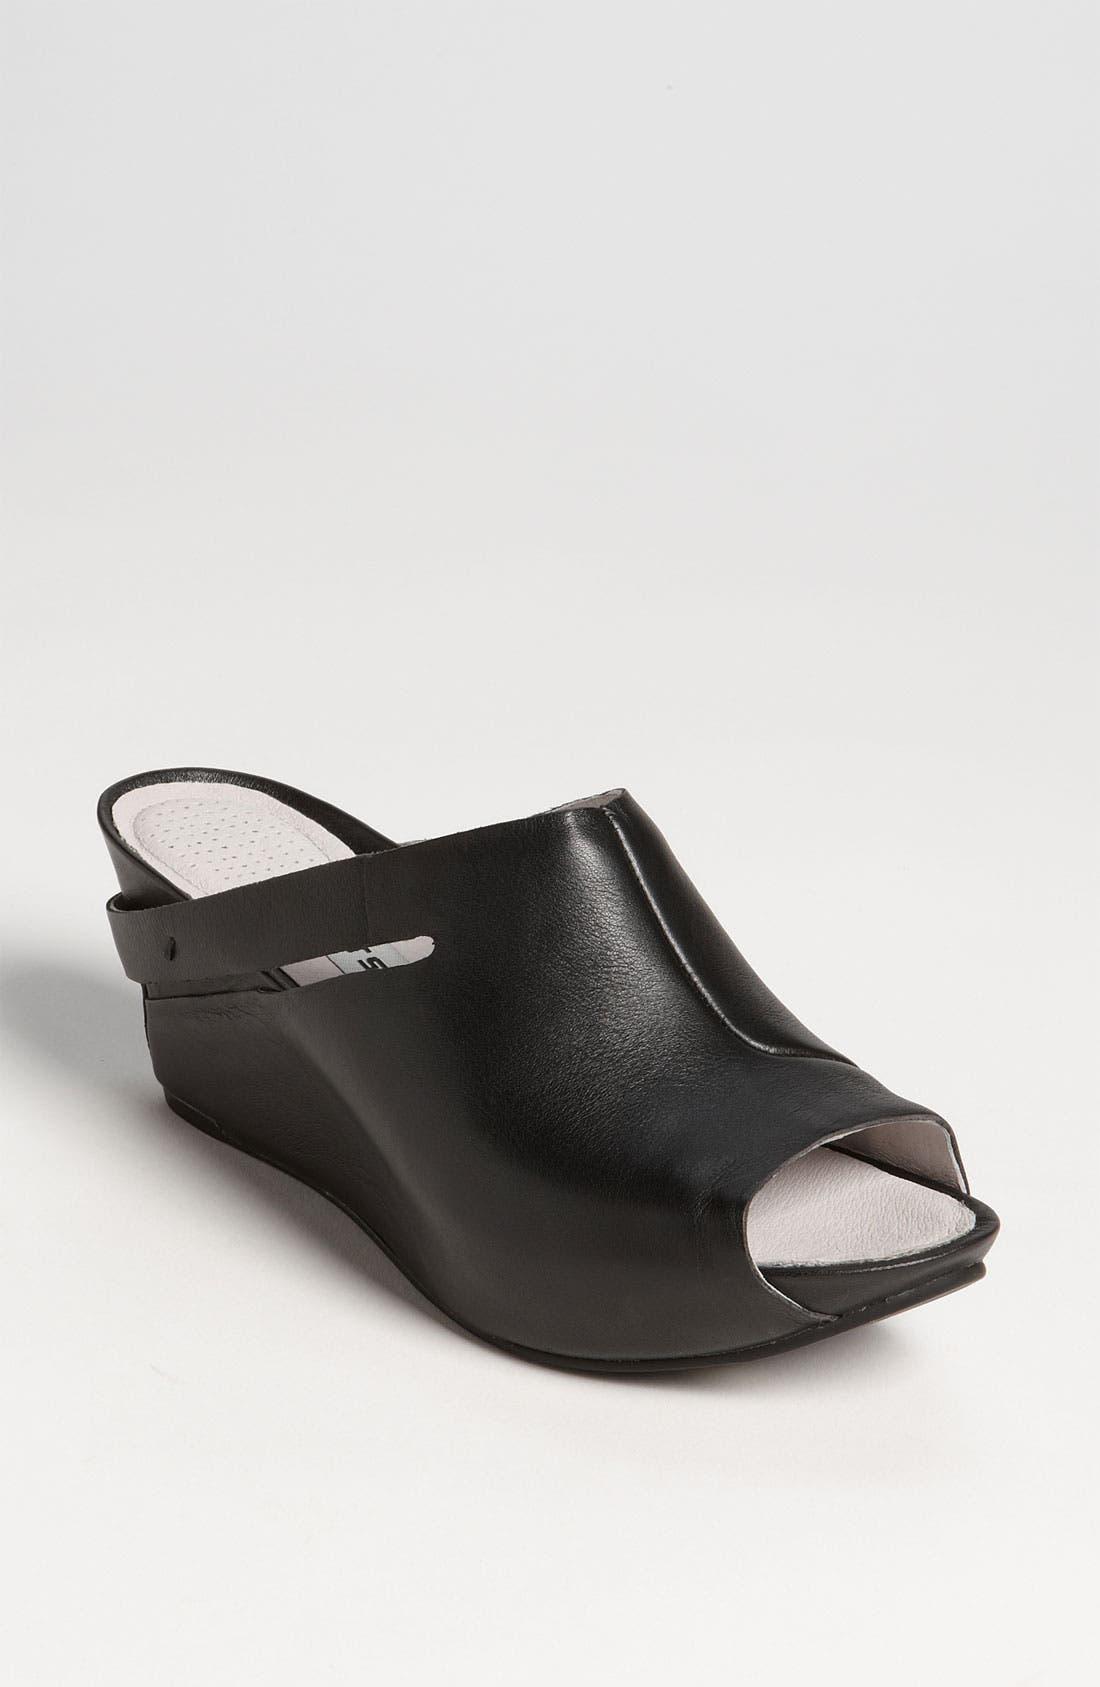 Alternate Image 1 Selected - Tsubo 'Ovid' Sandal